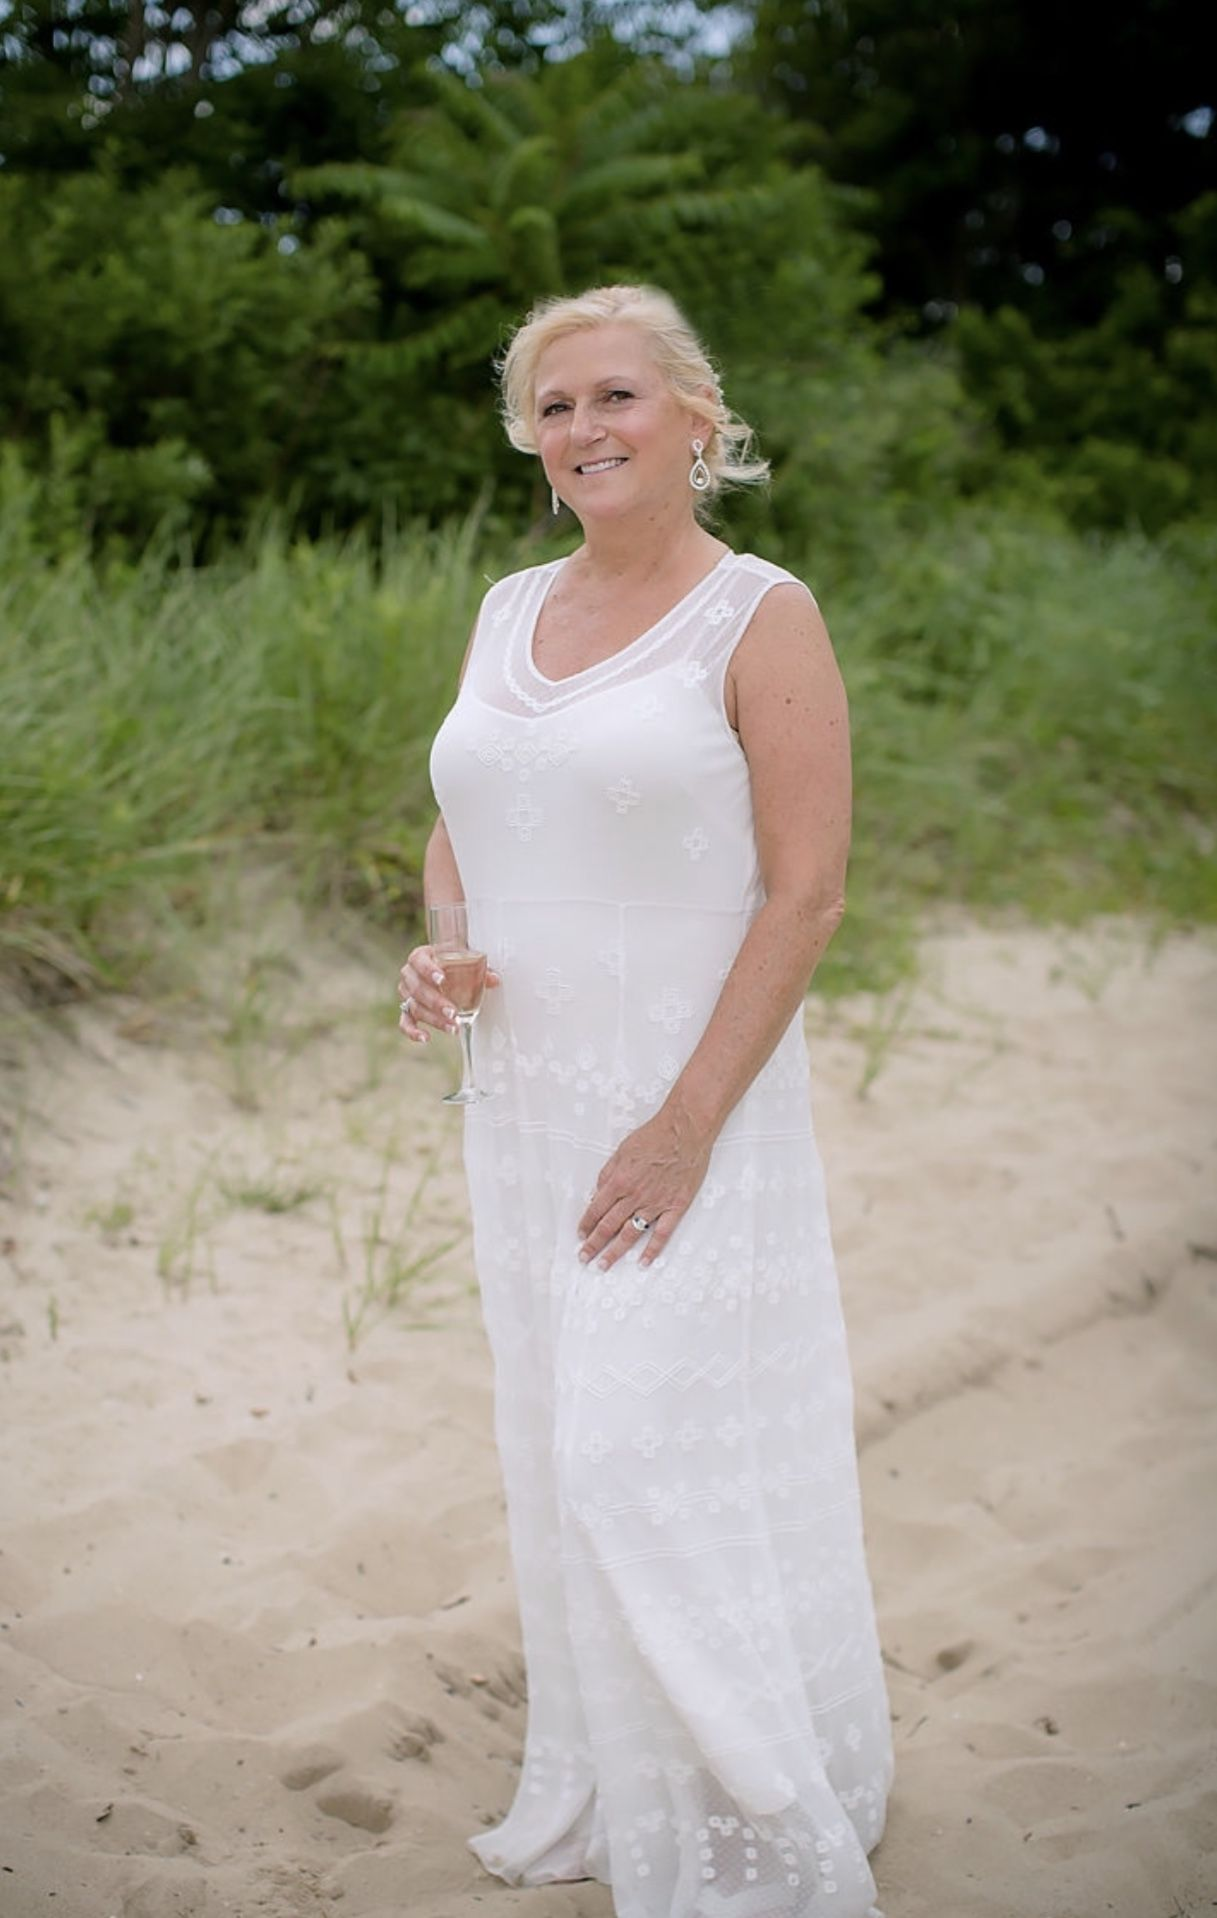 Pin by runawaywidow on Runaway Widow Dresses, Wedding